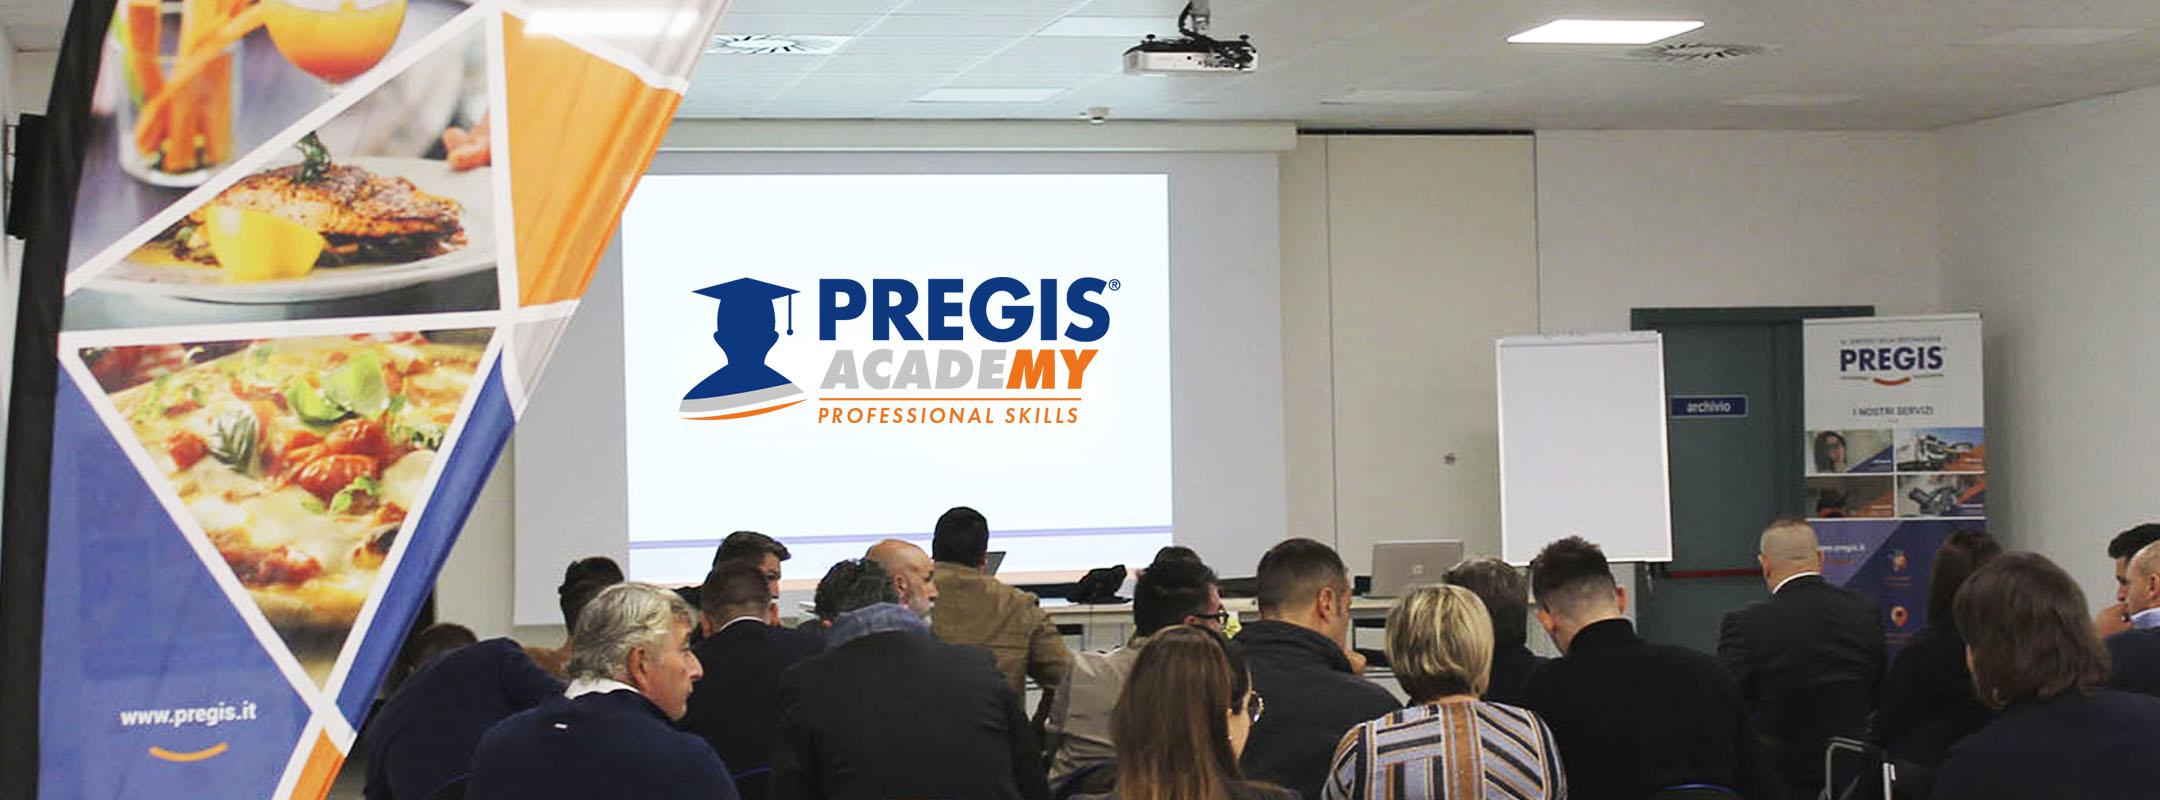 Pregis Academy: la strada verso la conoscenza.